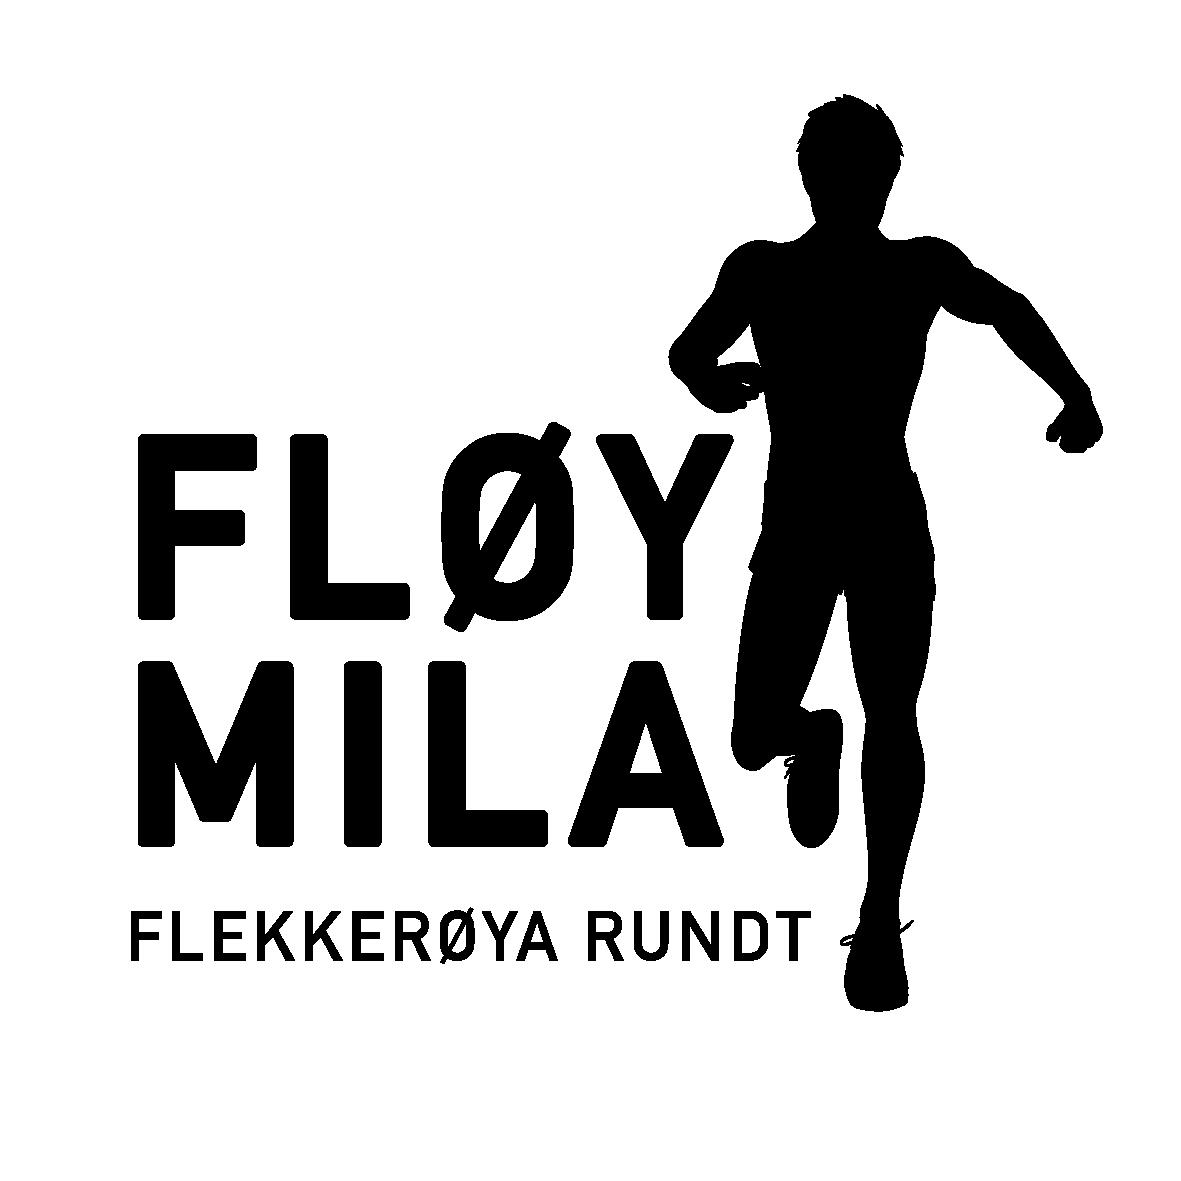 Fløymila